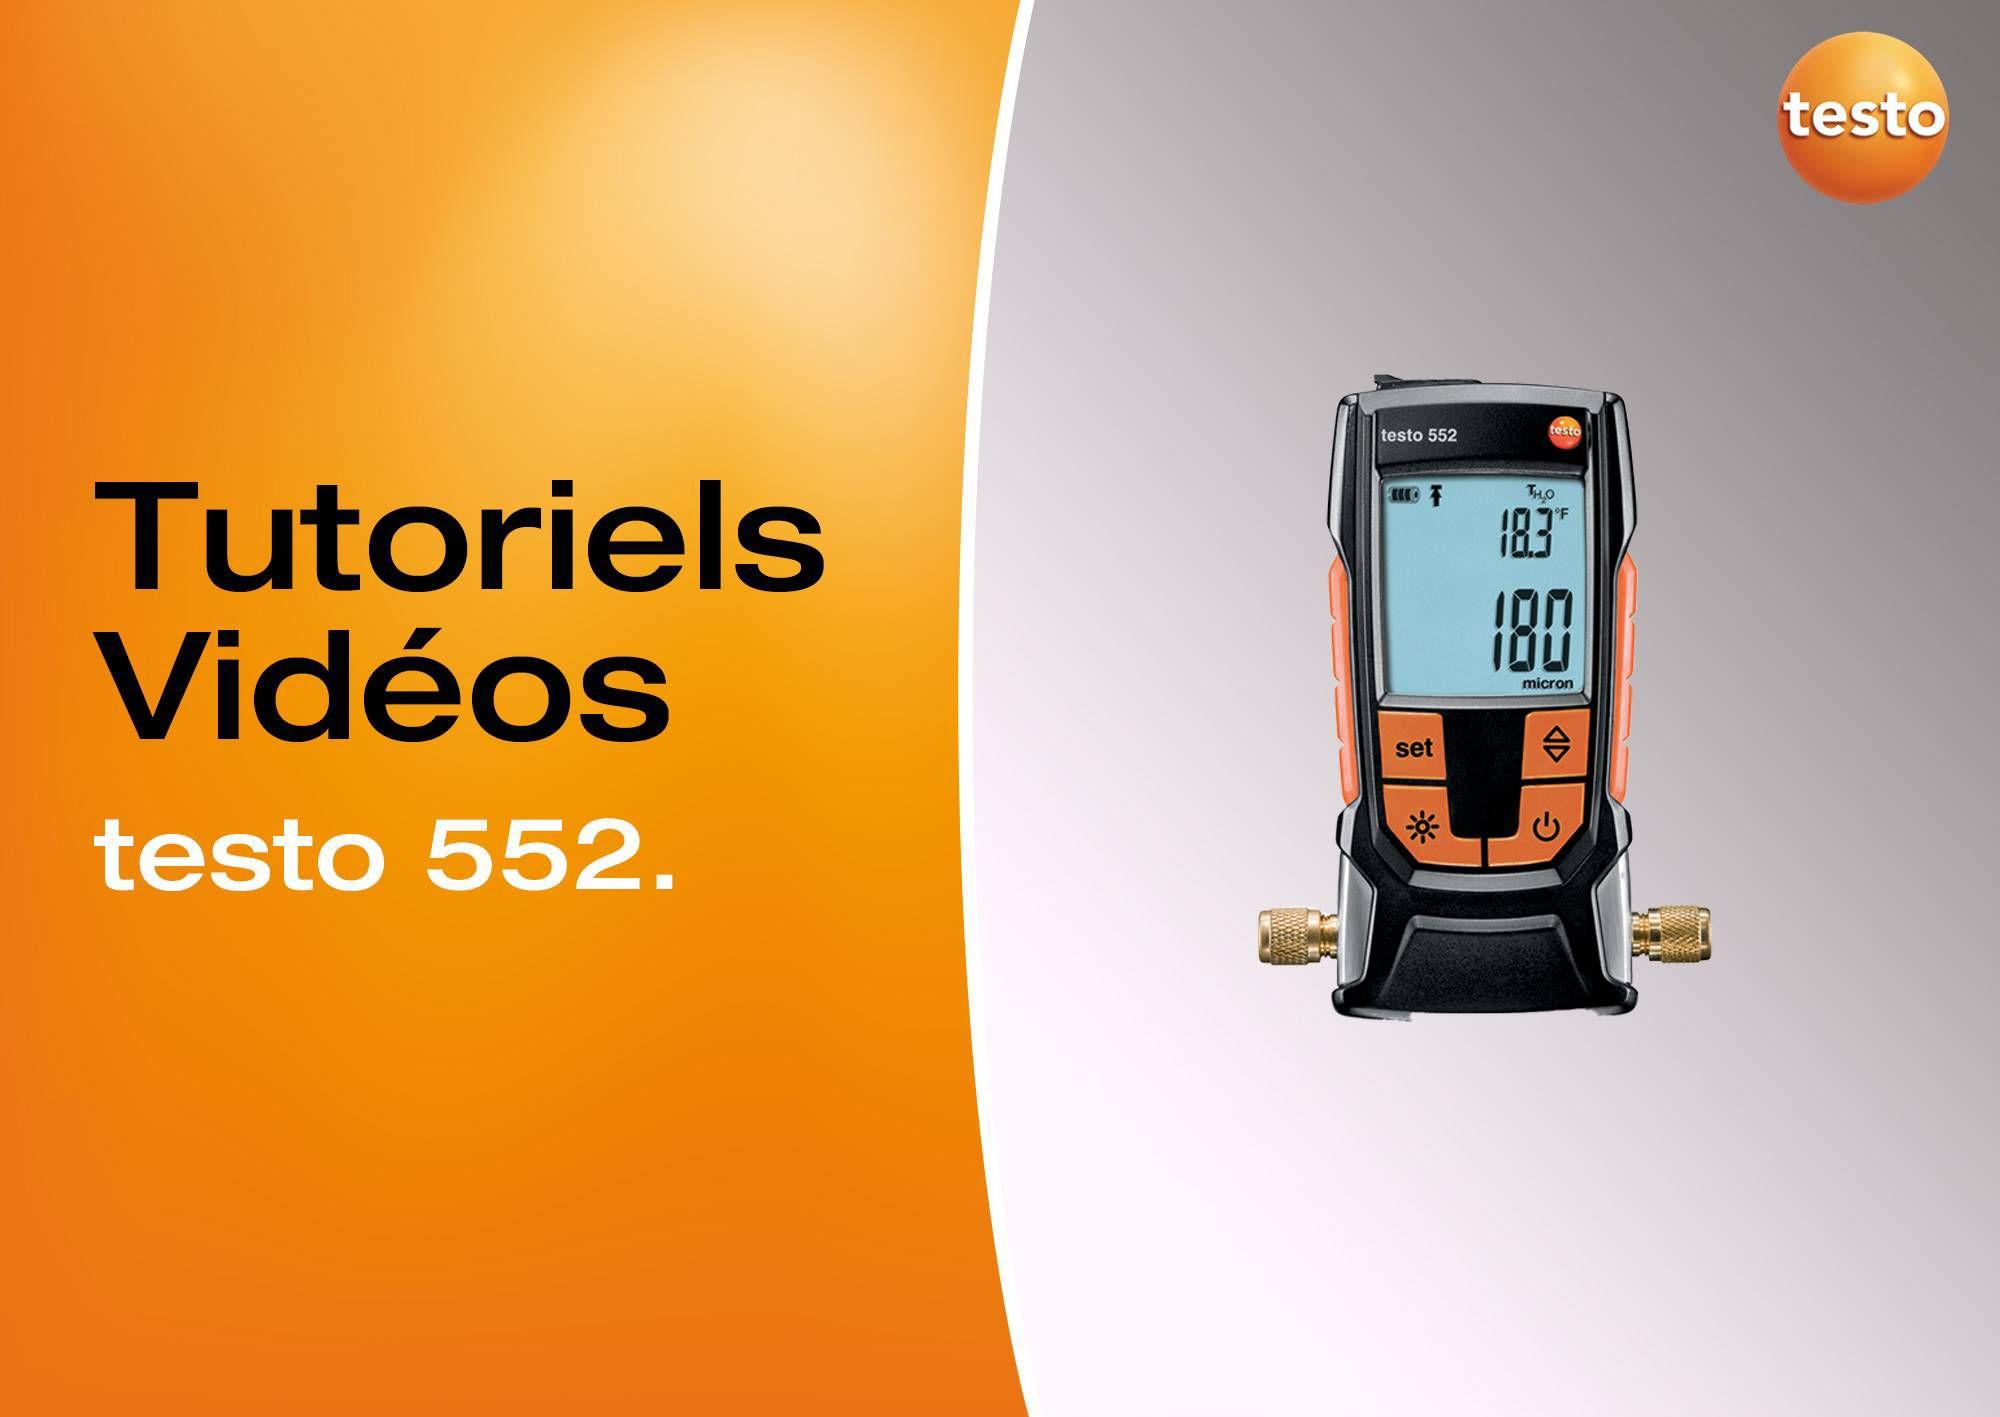 Tutoriels vidéos vacuomètre testo 552